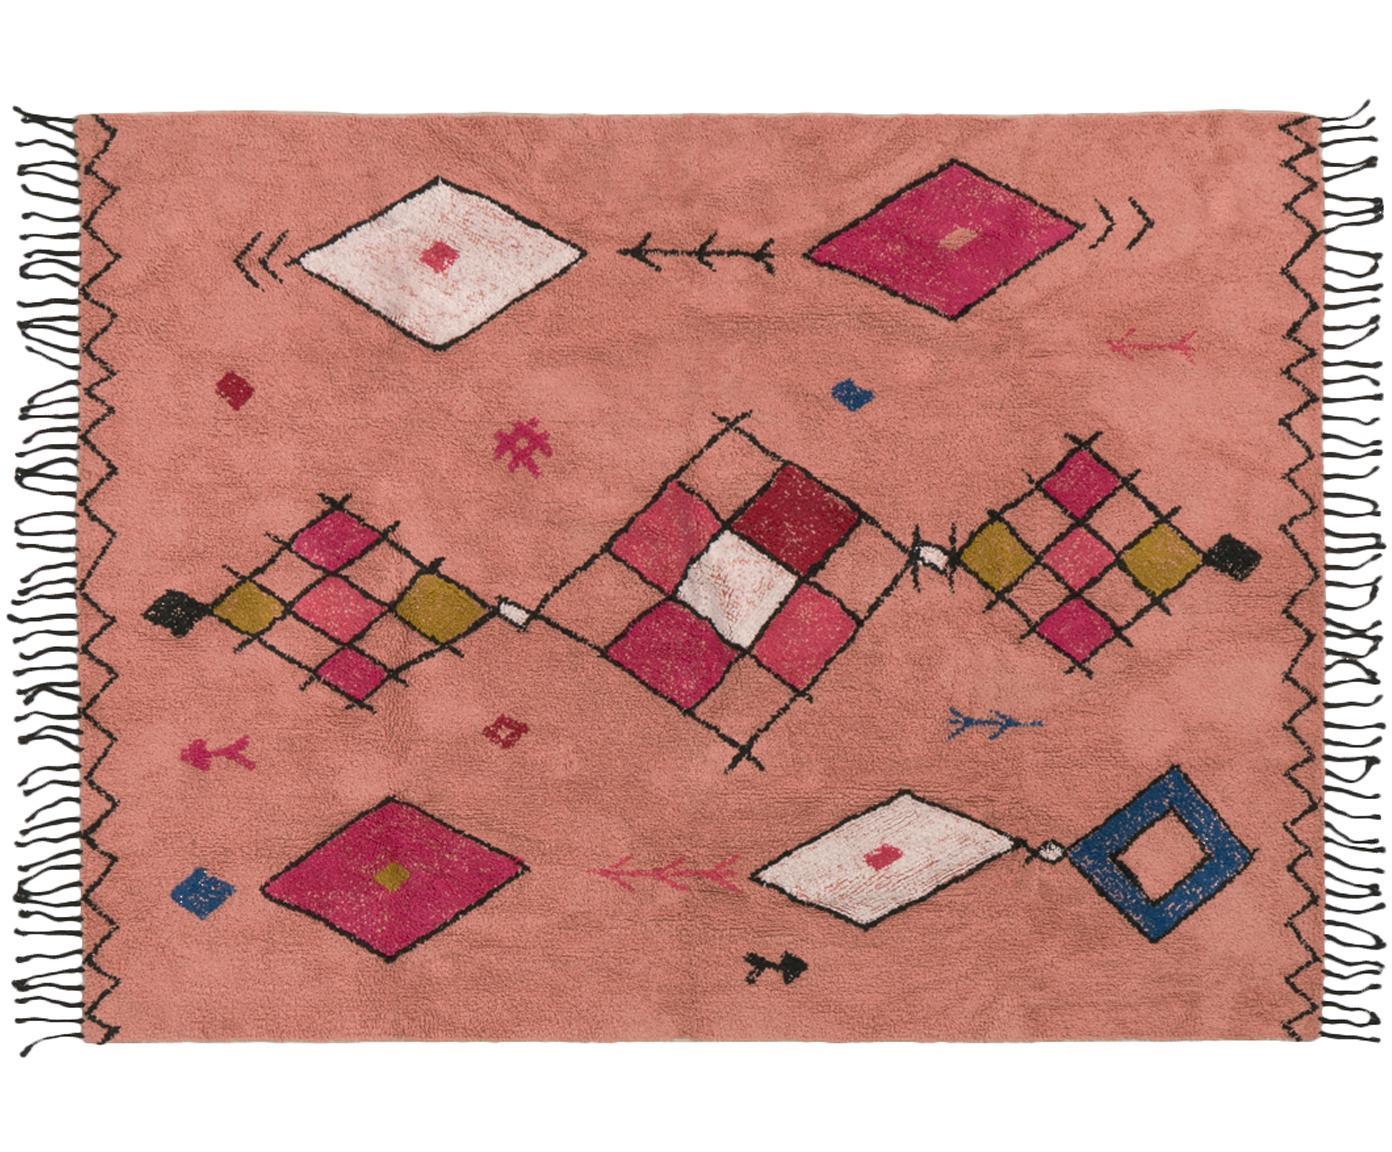 Vloerkleed Bereber, Katoen, Koraalrood, multicolour, B 150 x L 200 cm (maat S)